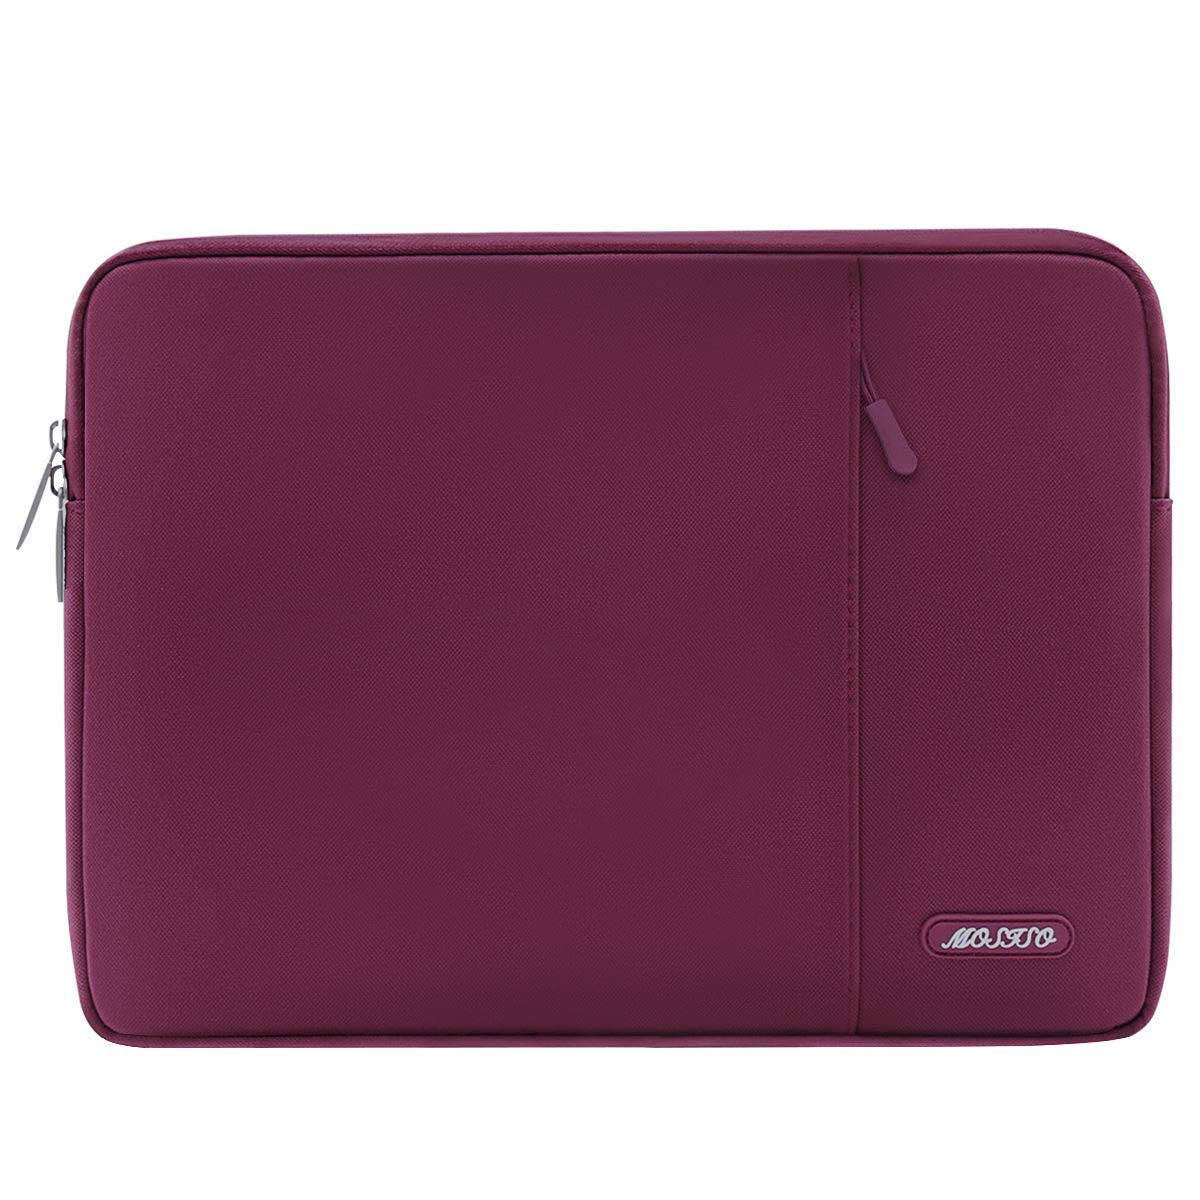 MOSISO Funda Protectora Compatible 11-11.6 Pulgadas MacBook Air Azul Marino Tableta de Ultrabook Netbook Poli/éster Bolsa Vertical Estilo Repelente de Agua Caja